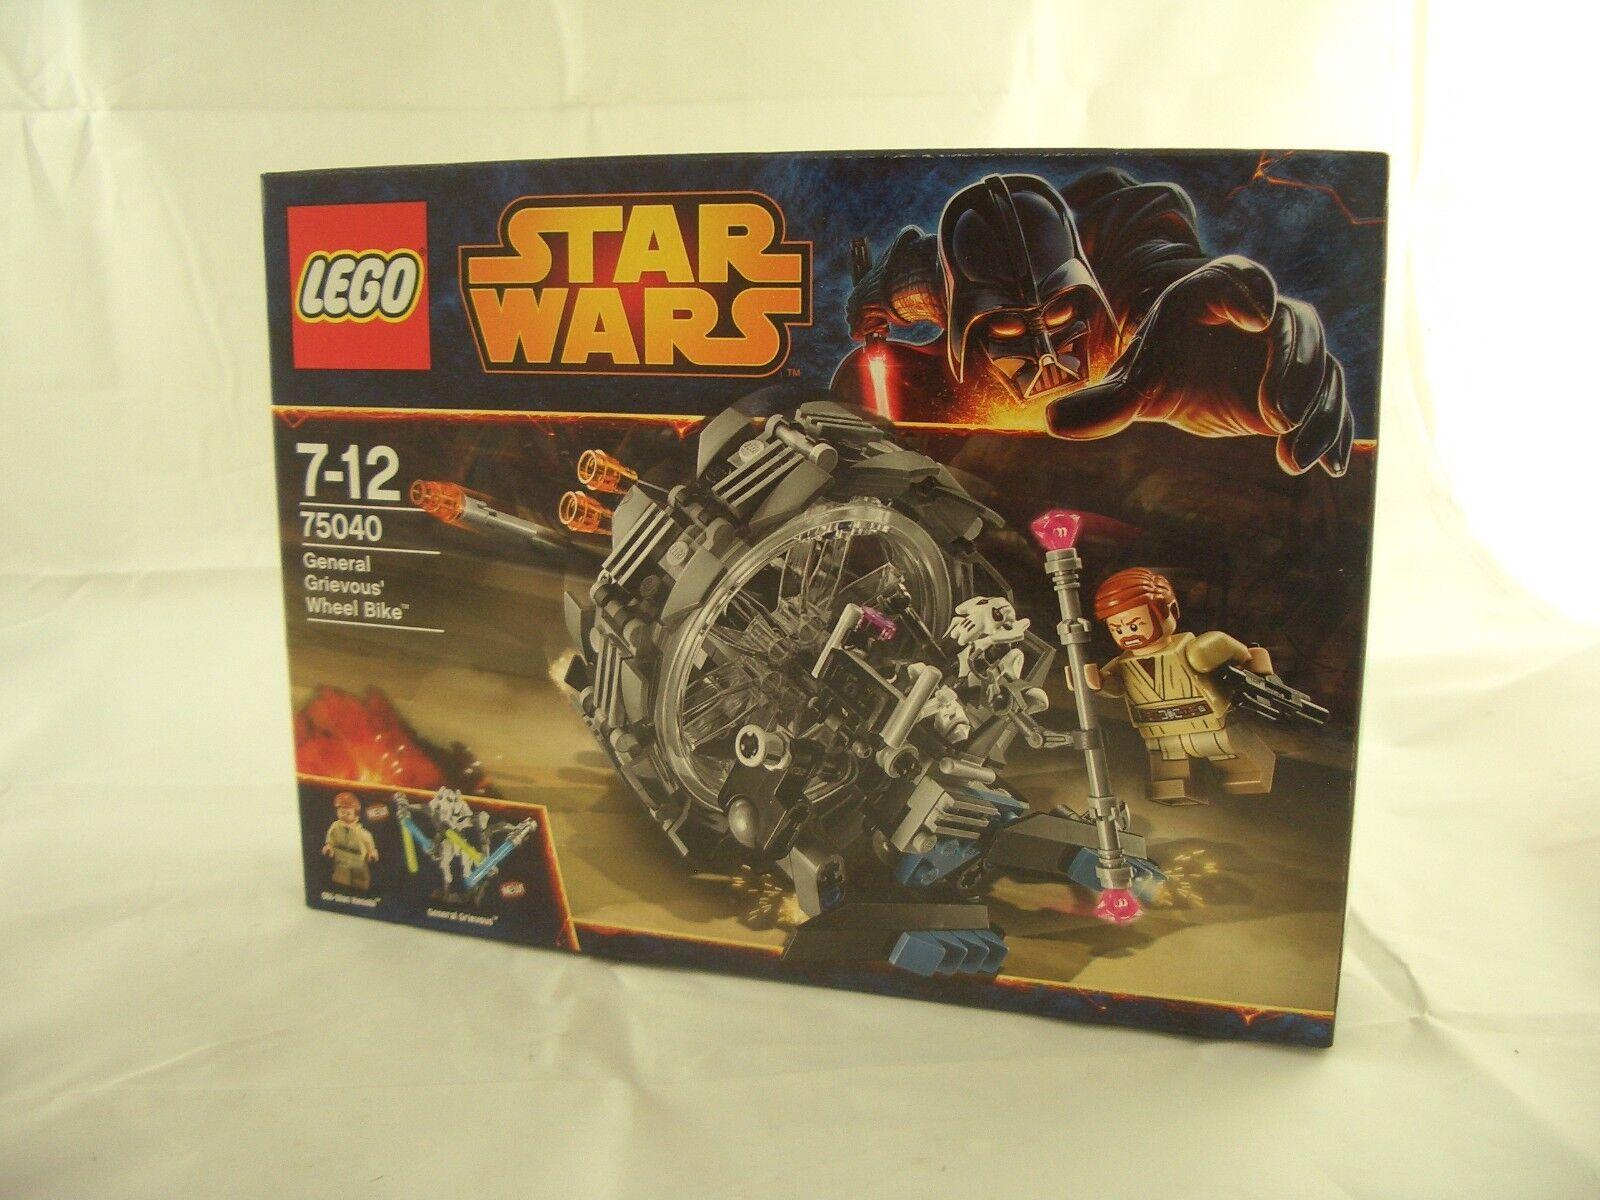 LEGO Star Wars  75040 General Grievous Wheel Fahrrad New Sealed